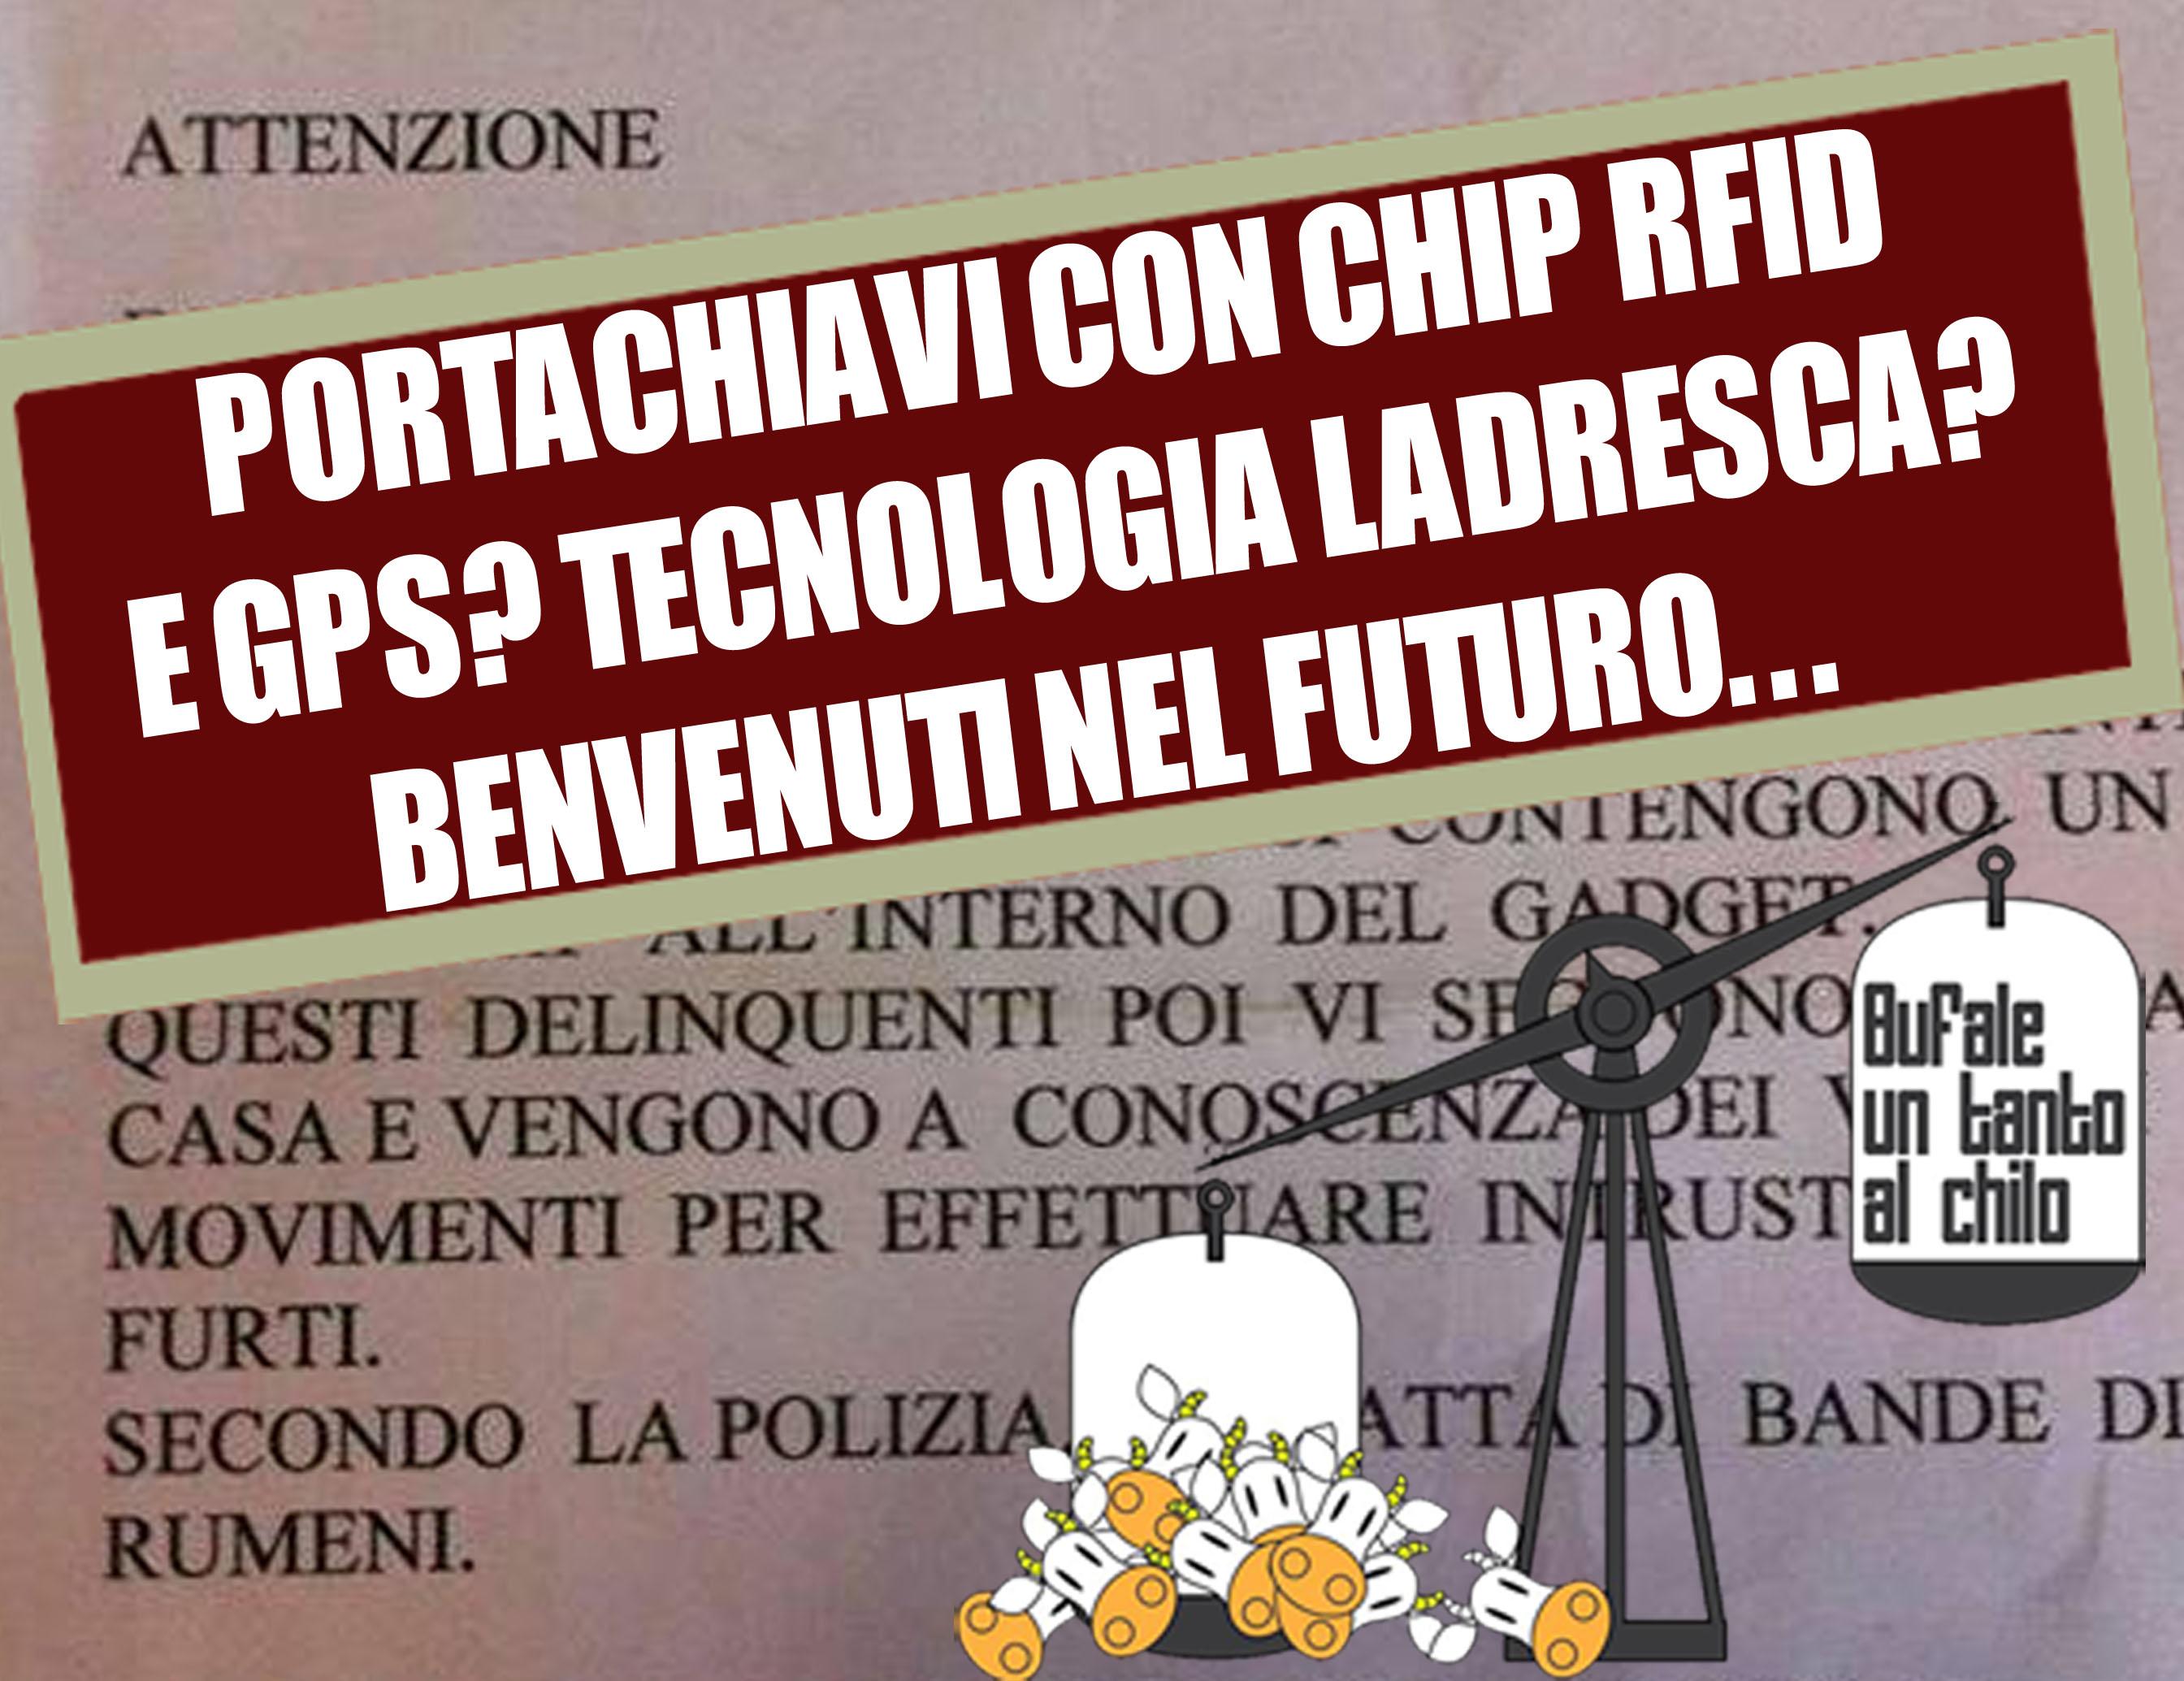 portachiavichip